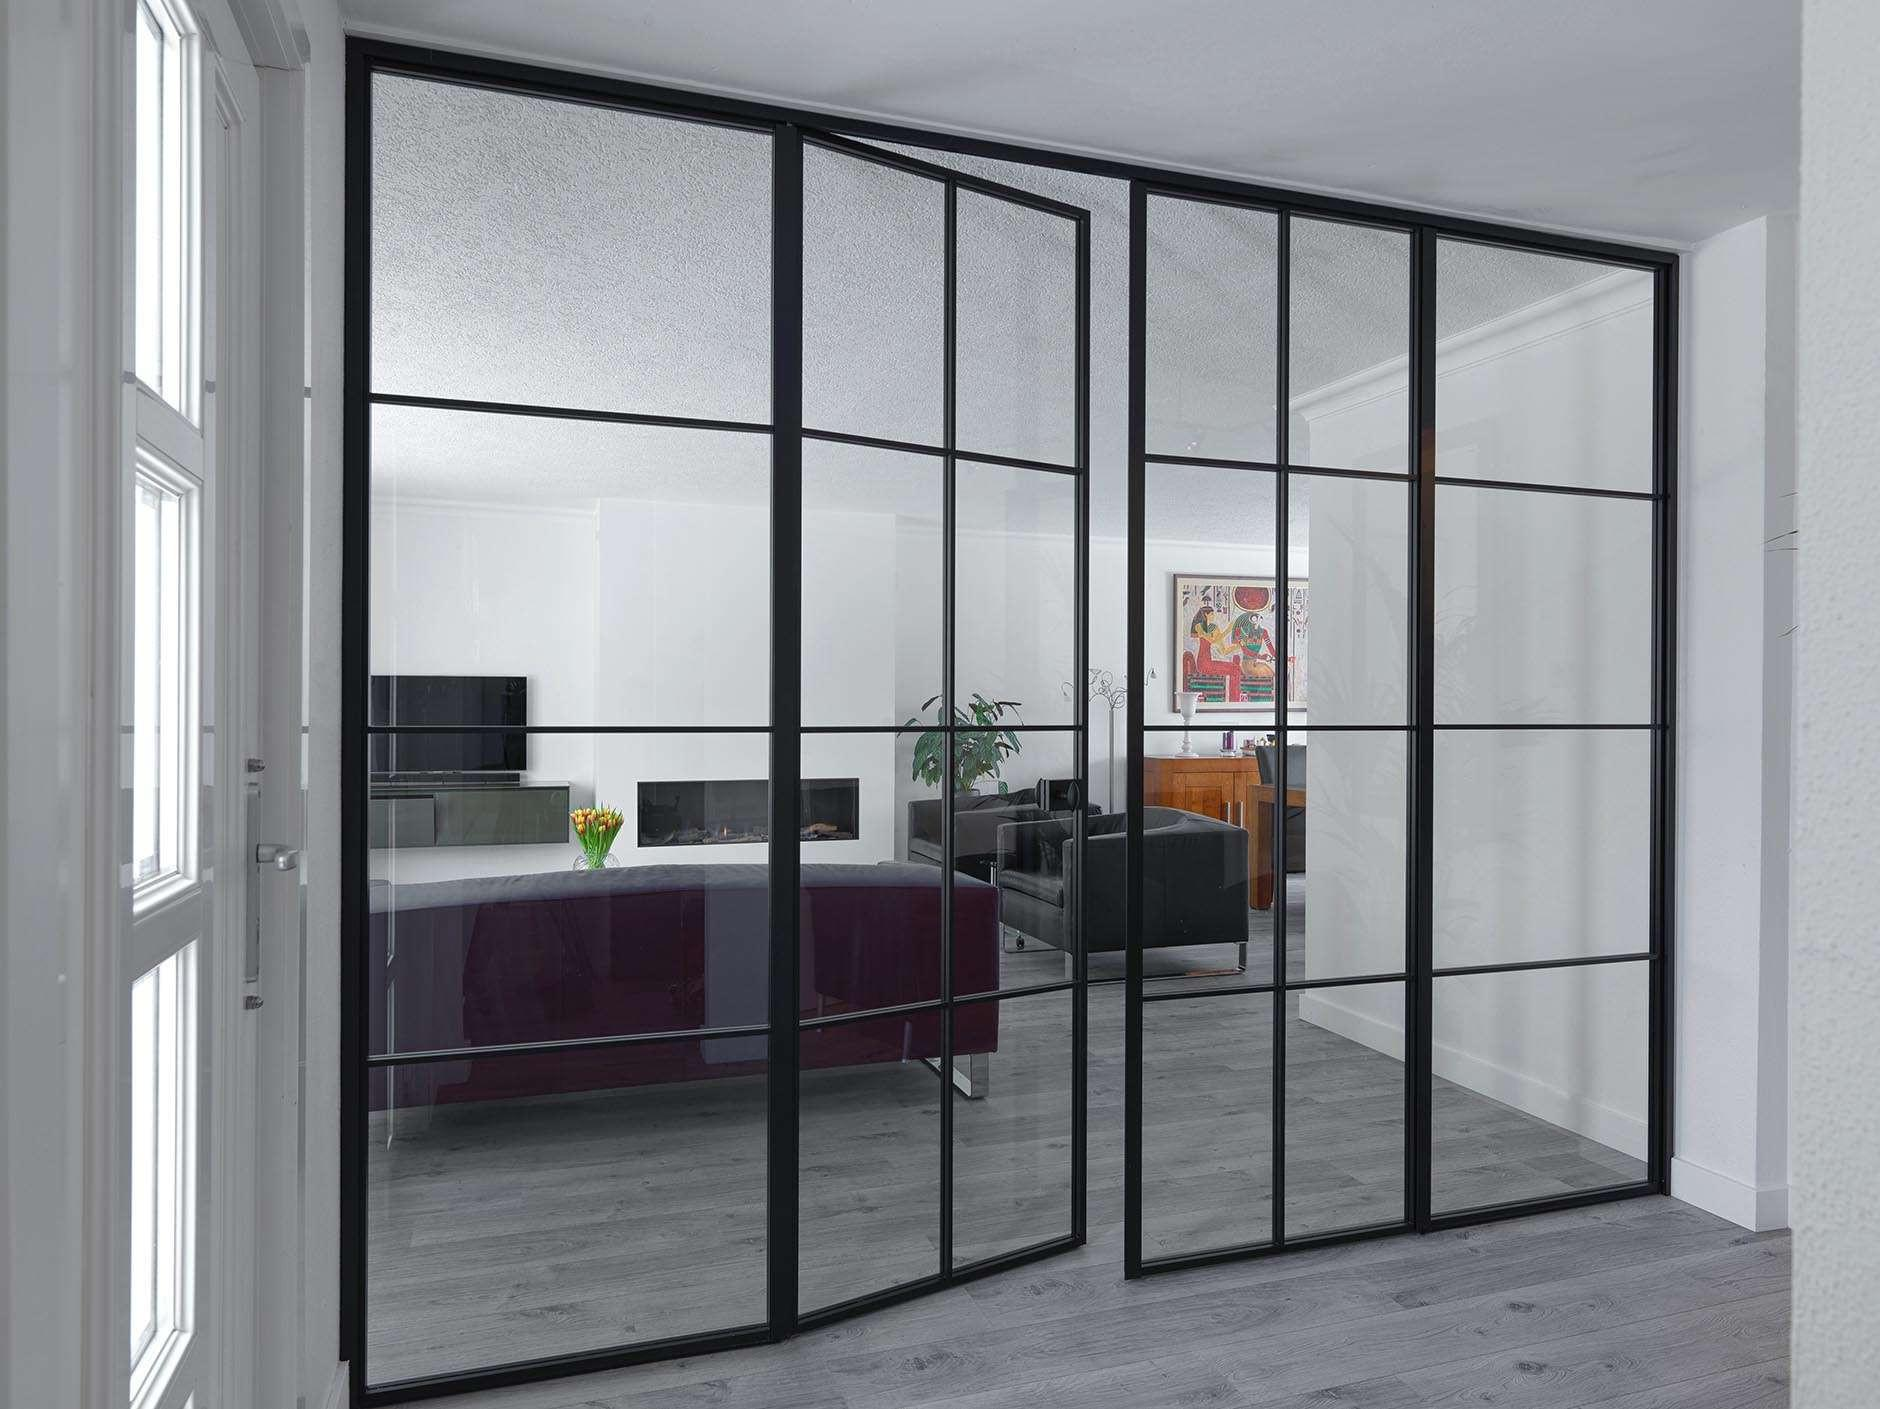 glazen-wand-dubbele-deur-zwarte-kader